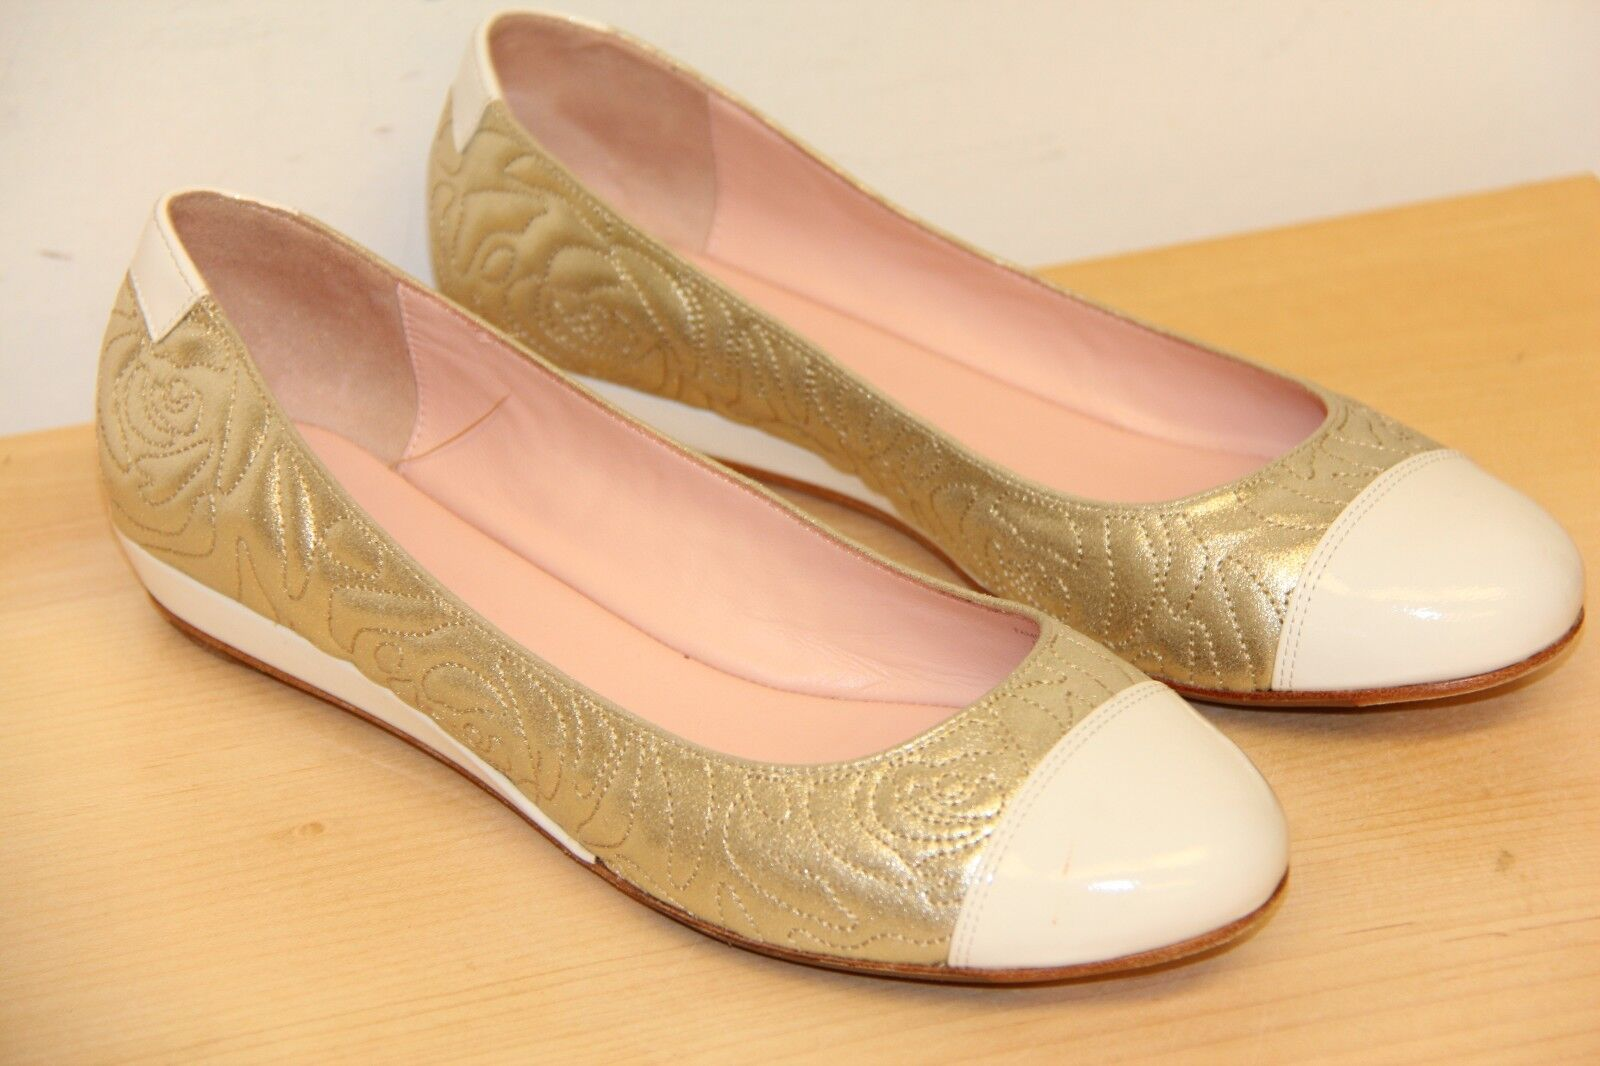 NIB Taryn Sz Rose PAMONA Suede Patent Leather Slip On Flats Sz Taryn 9.5 Gold Whitre 7fb934